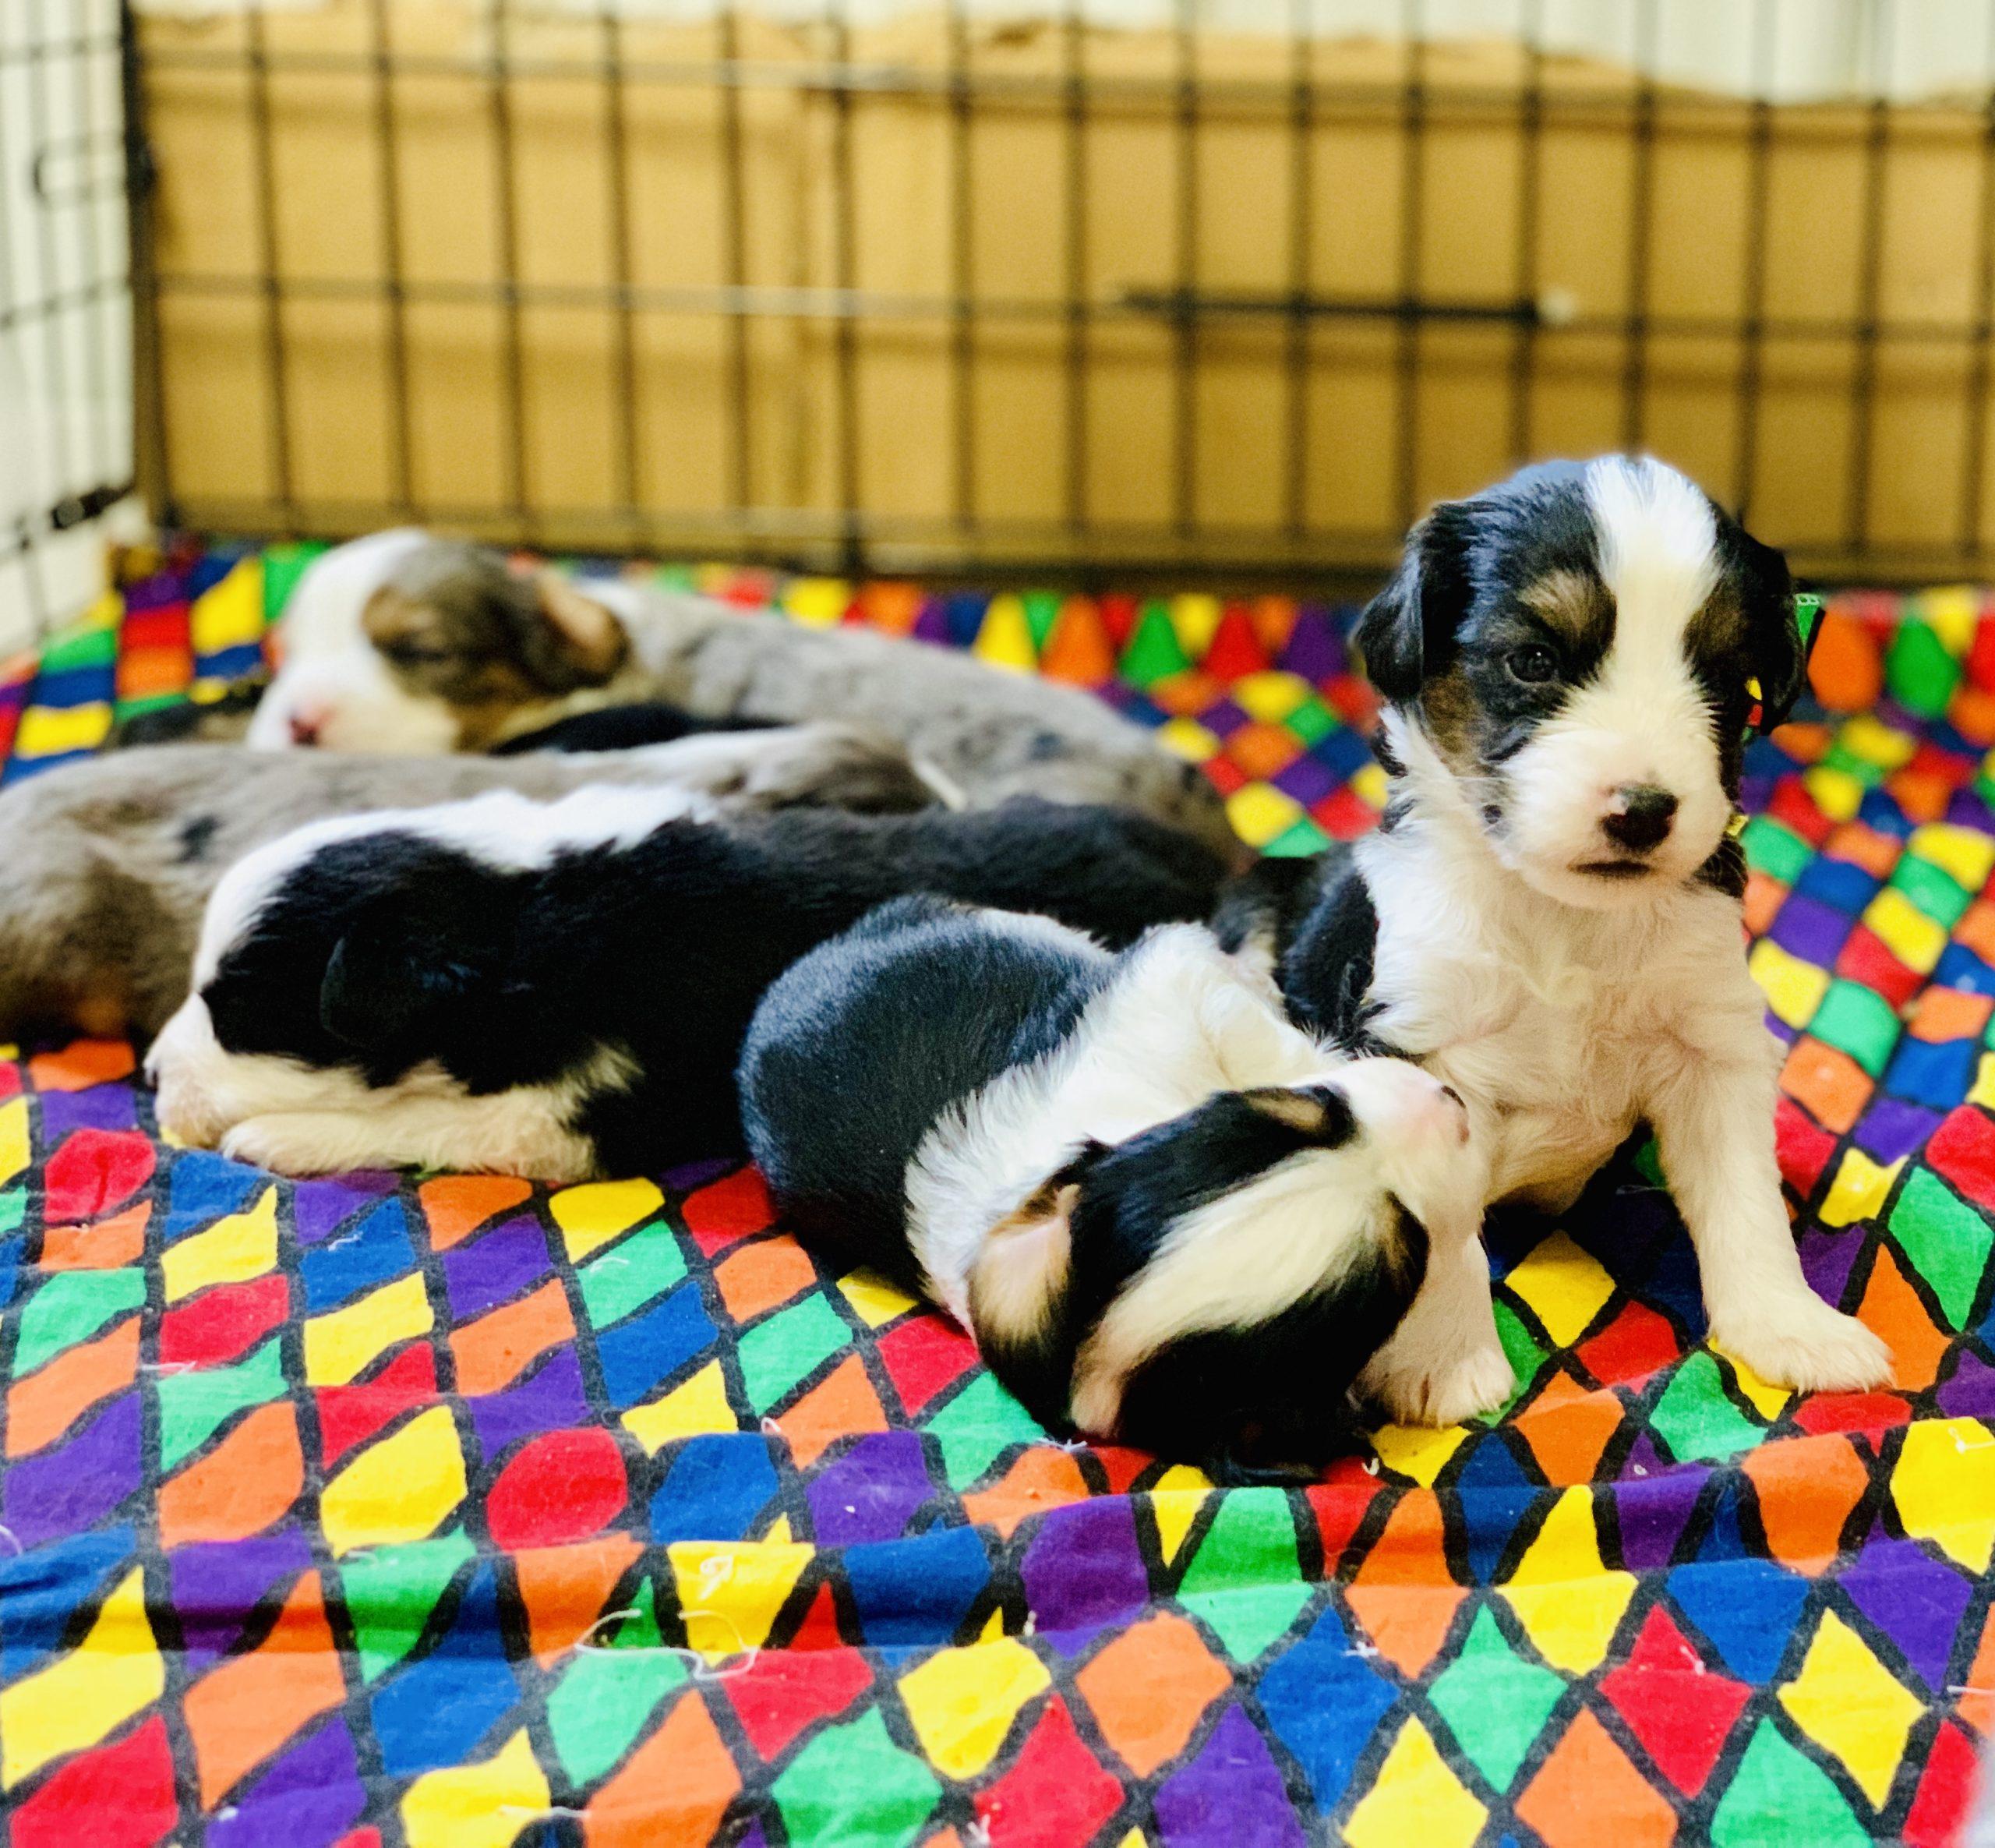 A litter of puppies